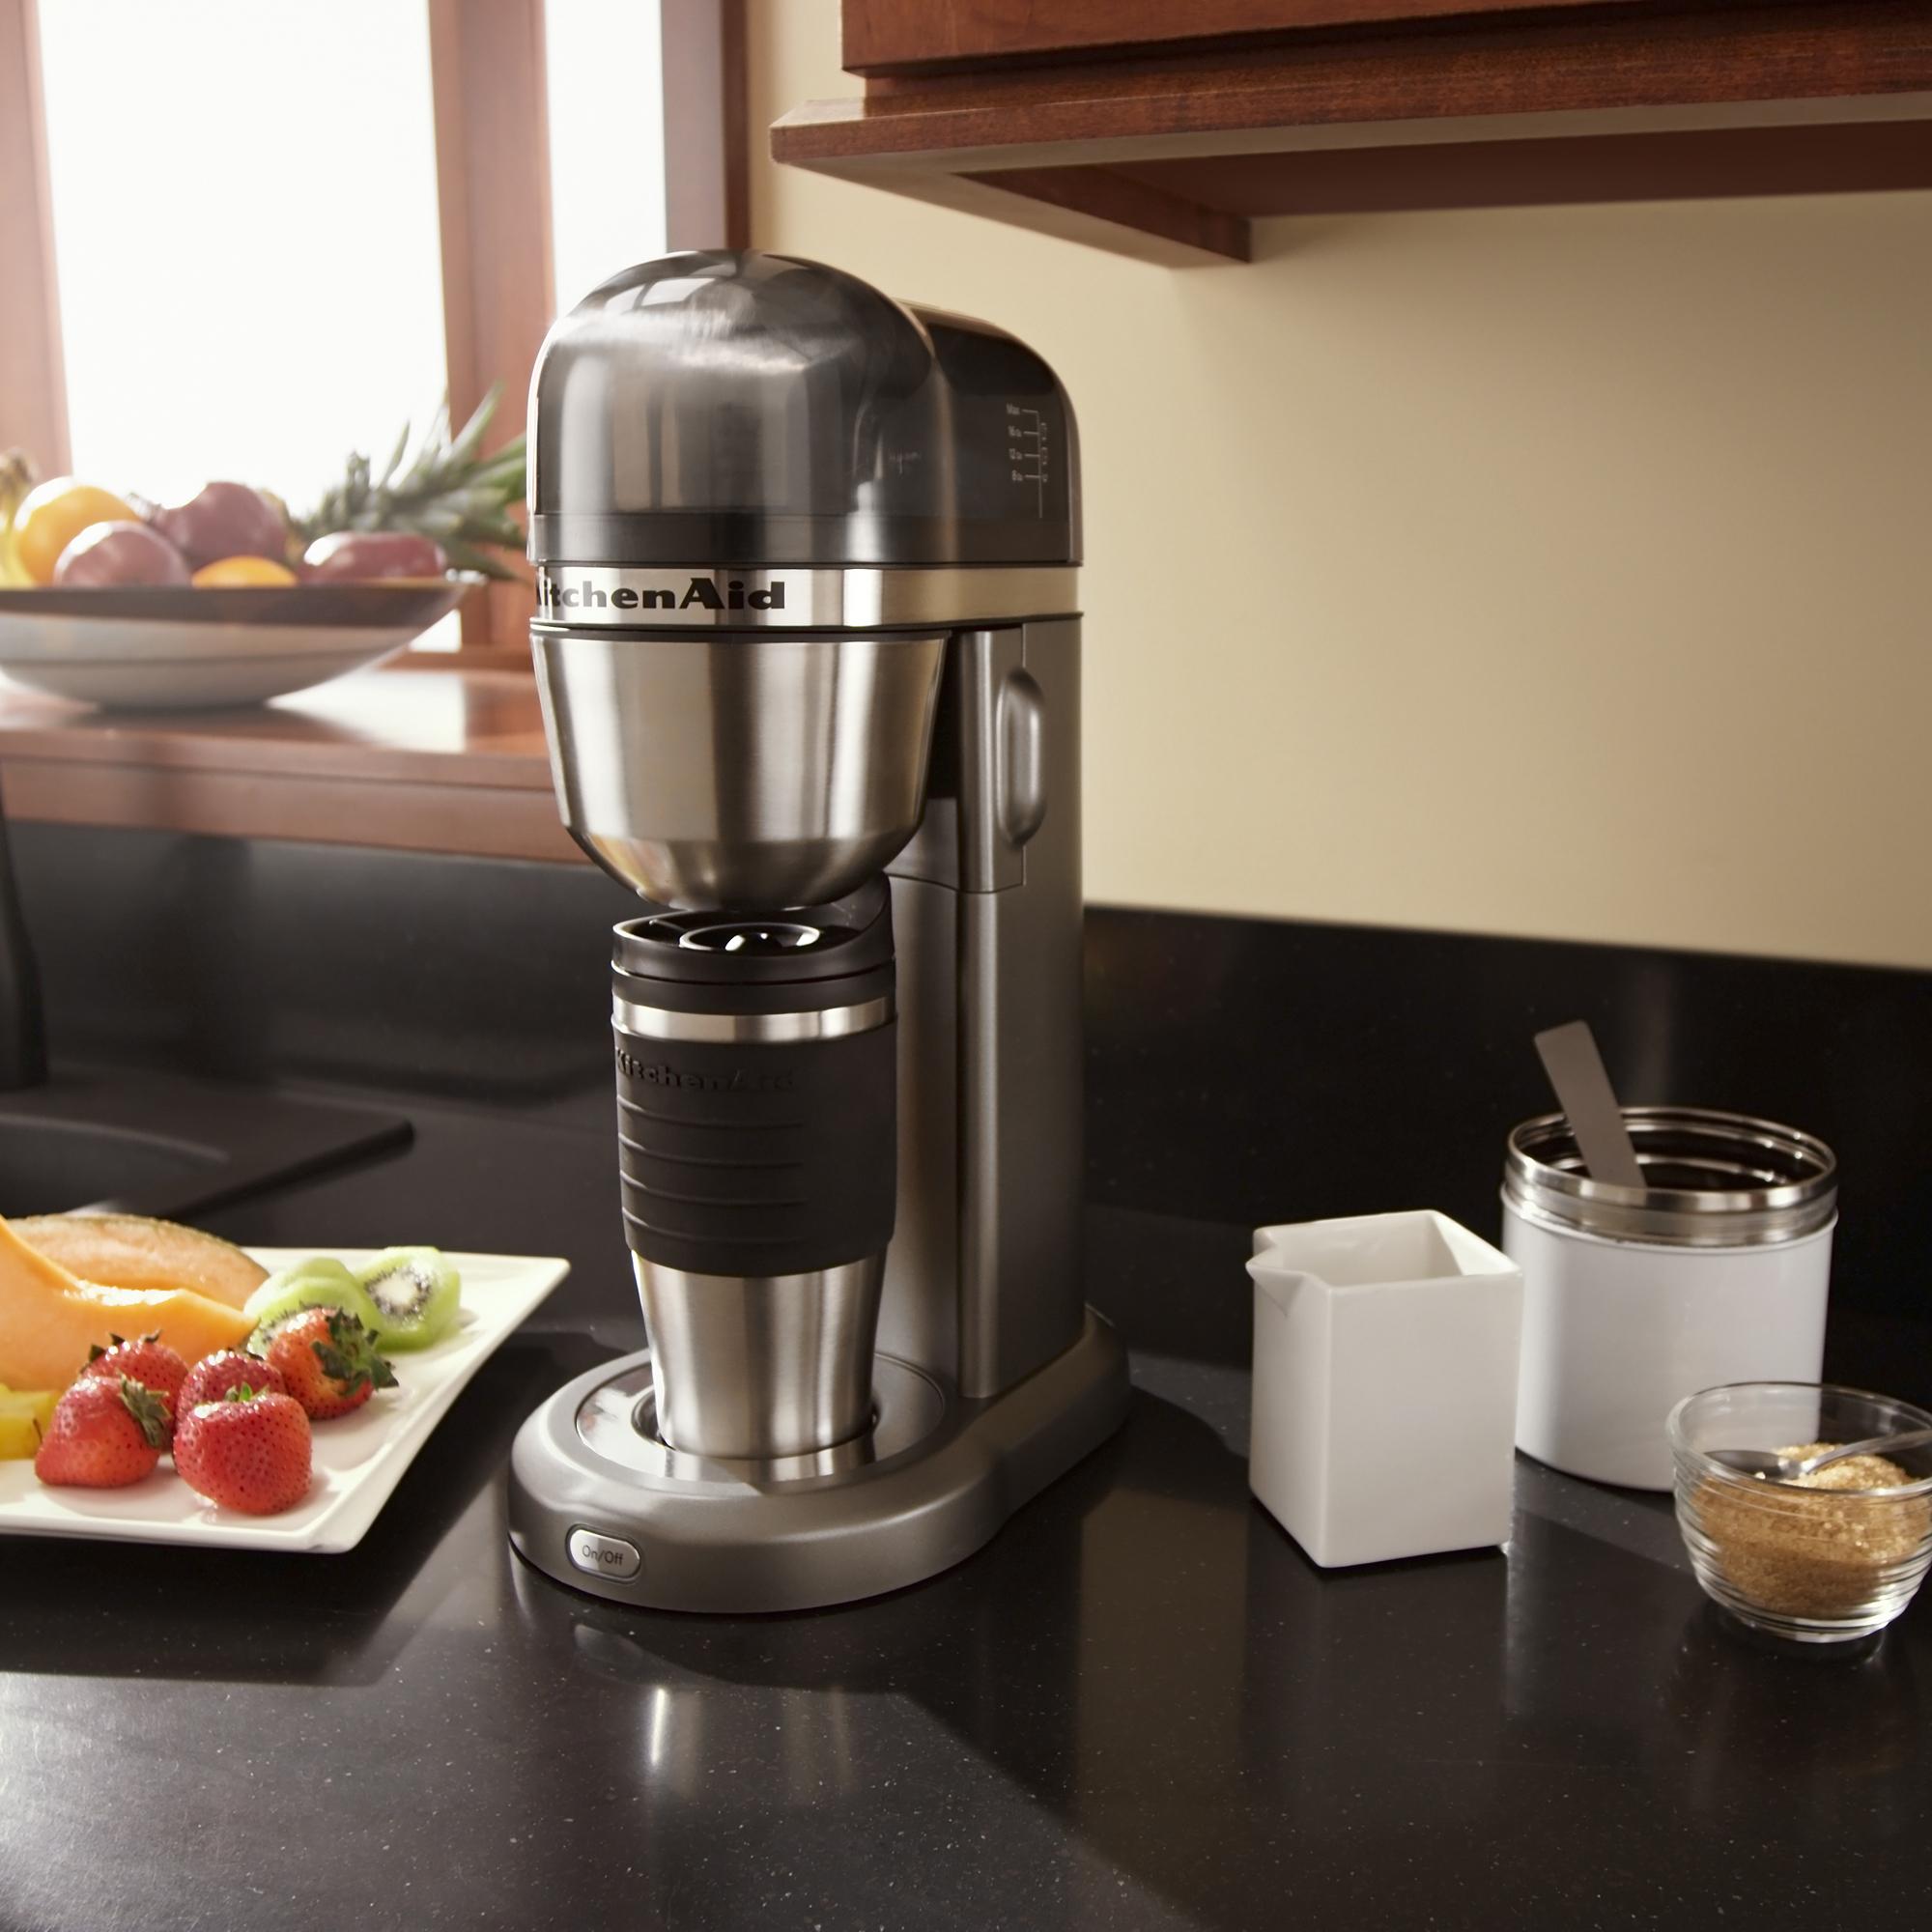 KitchenAid-Refurbished-Personal-Coffee-Maker-with-18-oz-Thermal-Mug-RKCM0402 thumbnail 6